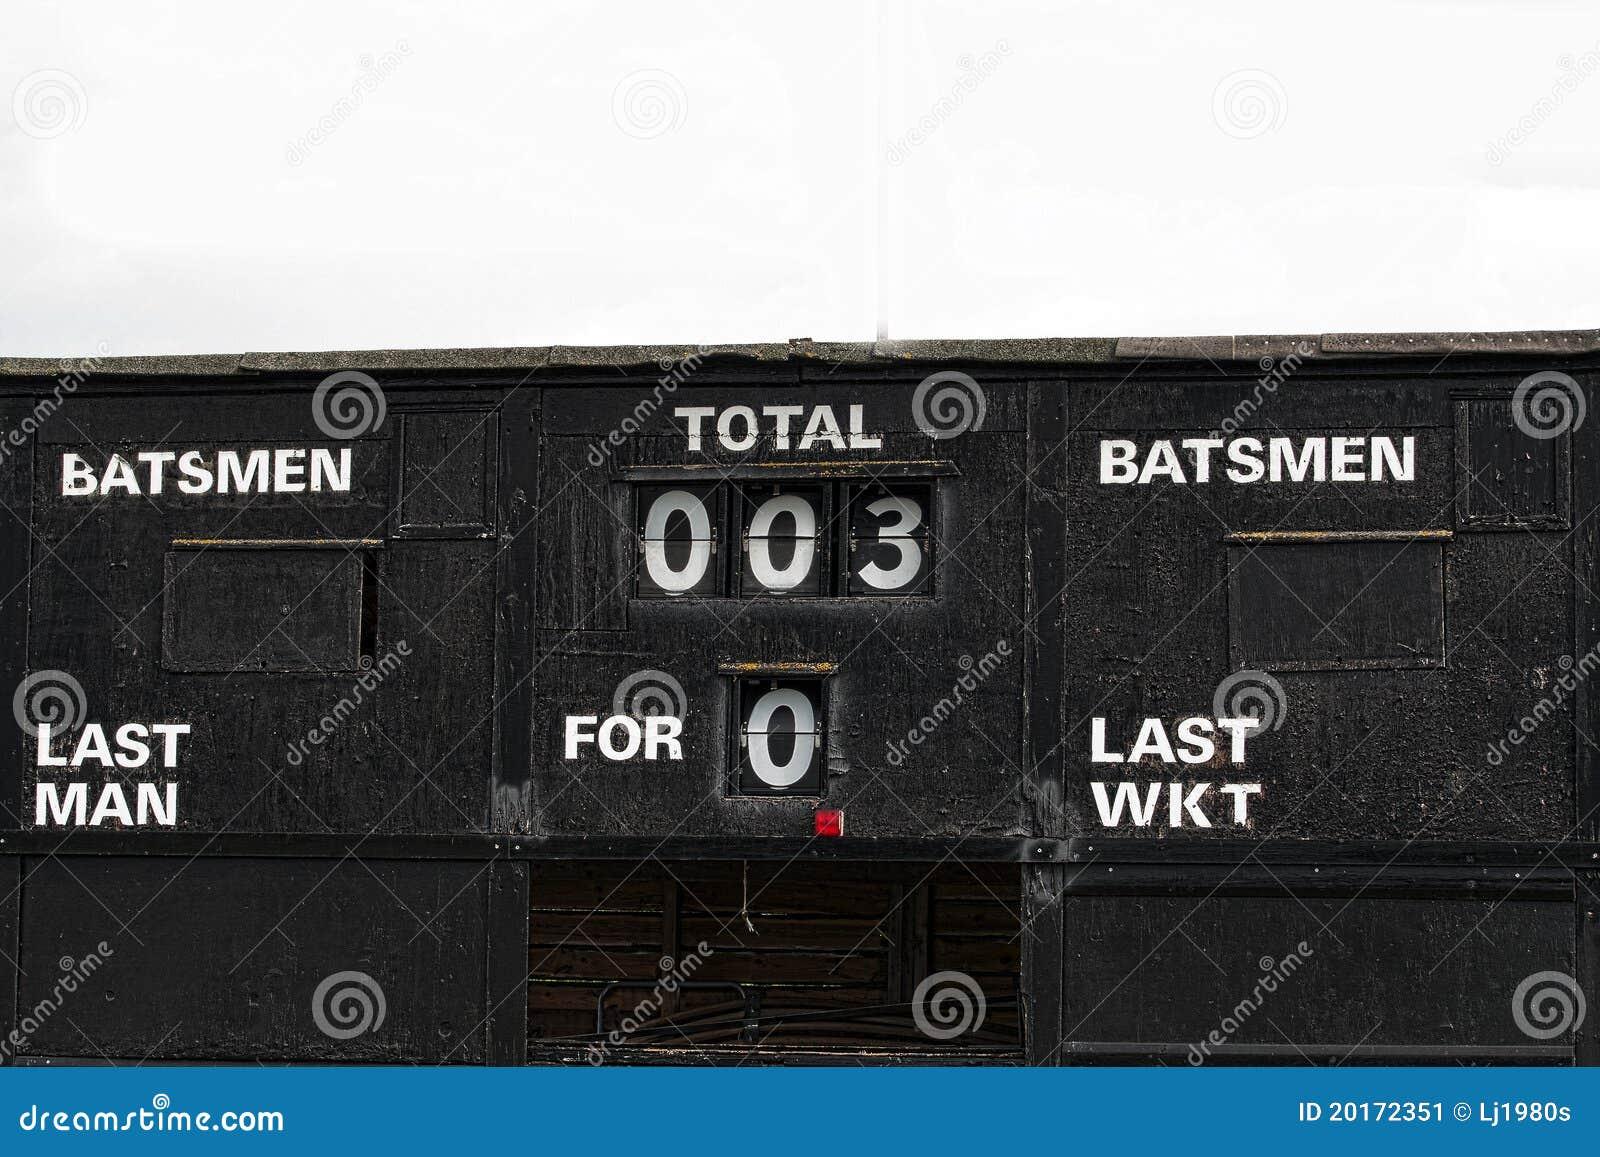 Vintage Cricket Score-board Stock Image - Image of english, vintage